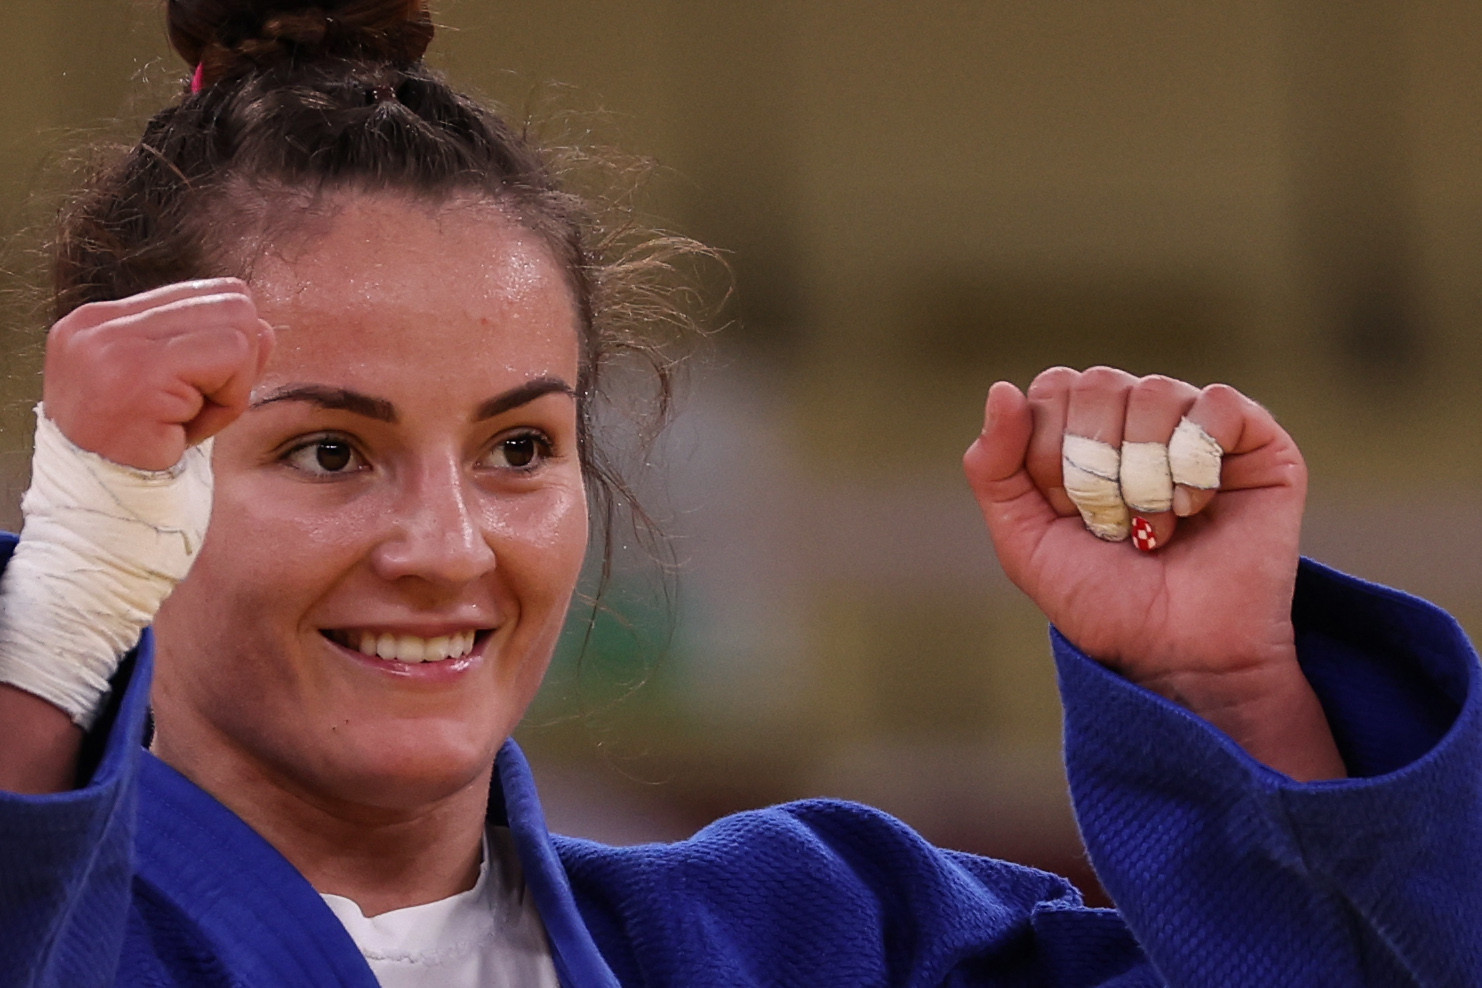 World champion Matić to lead Croatian charge at IJF Zagreb Grand Prix